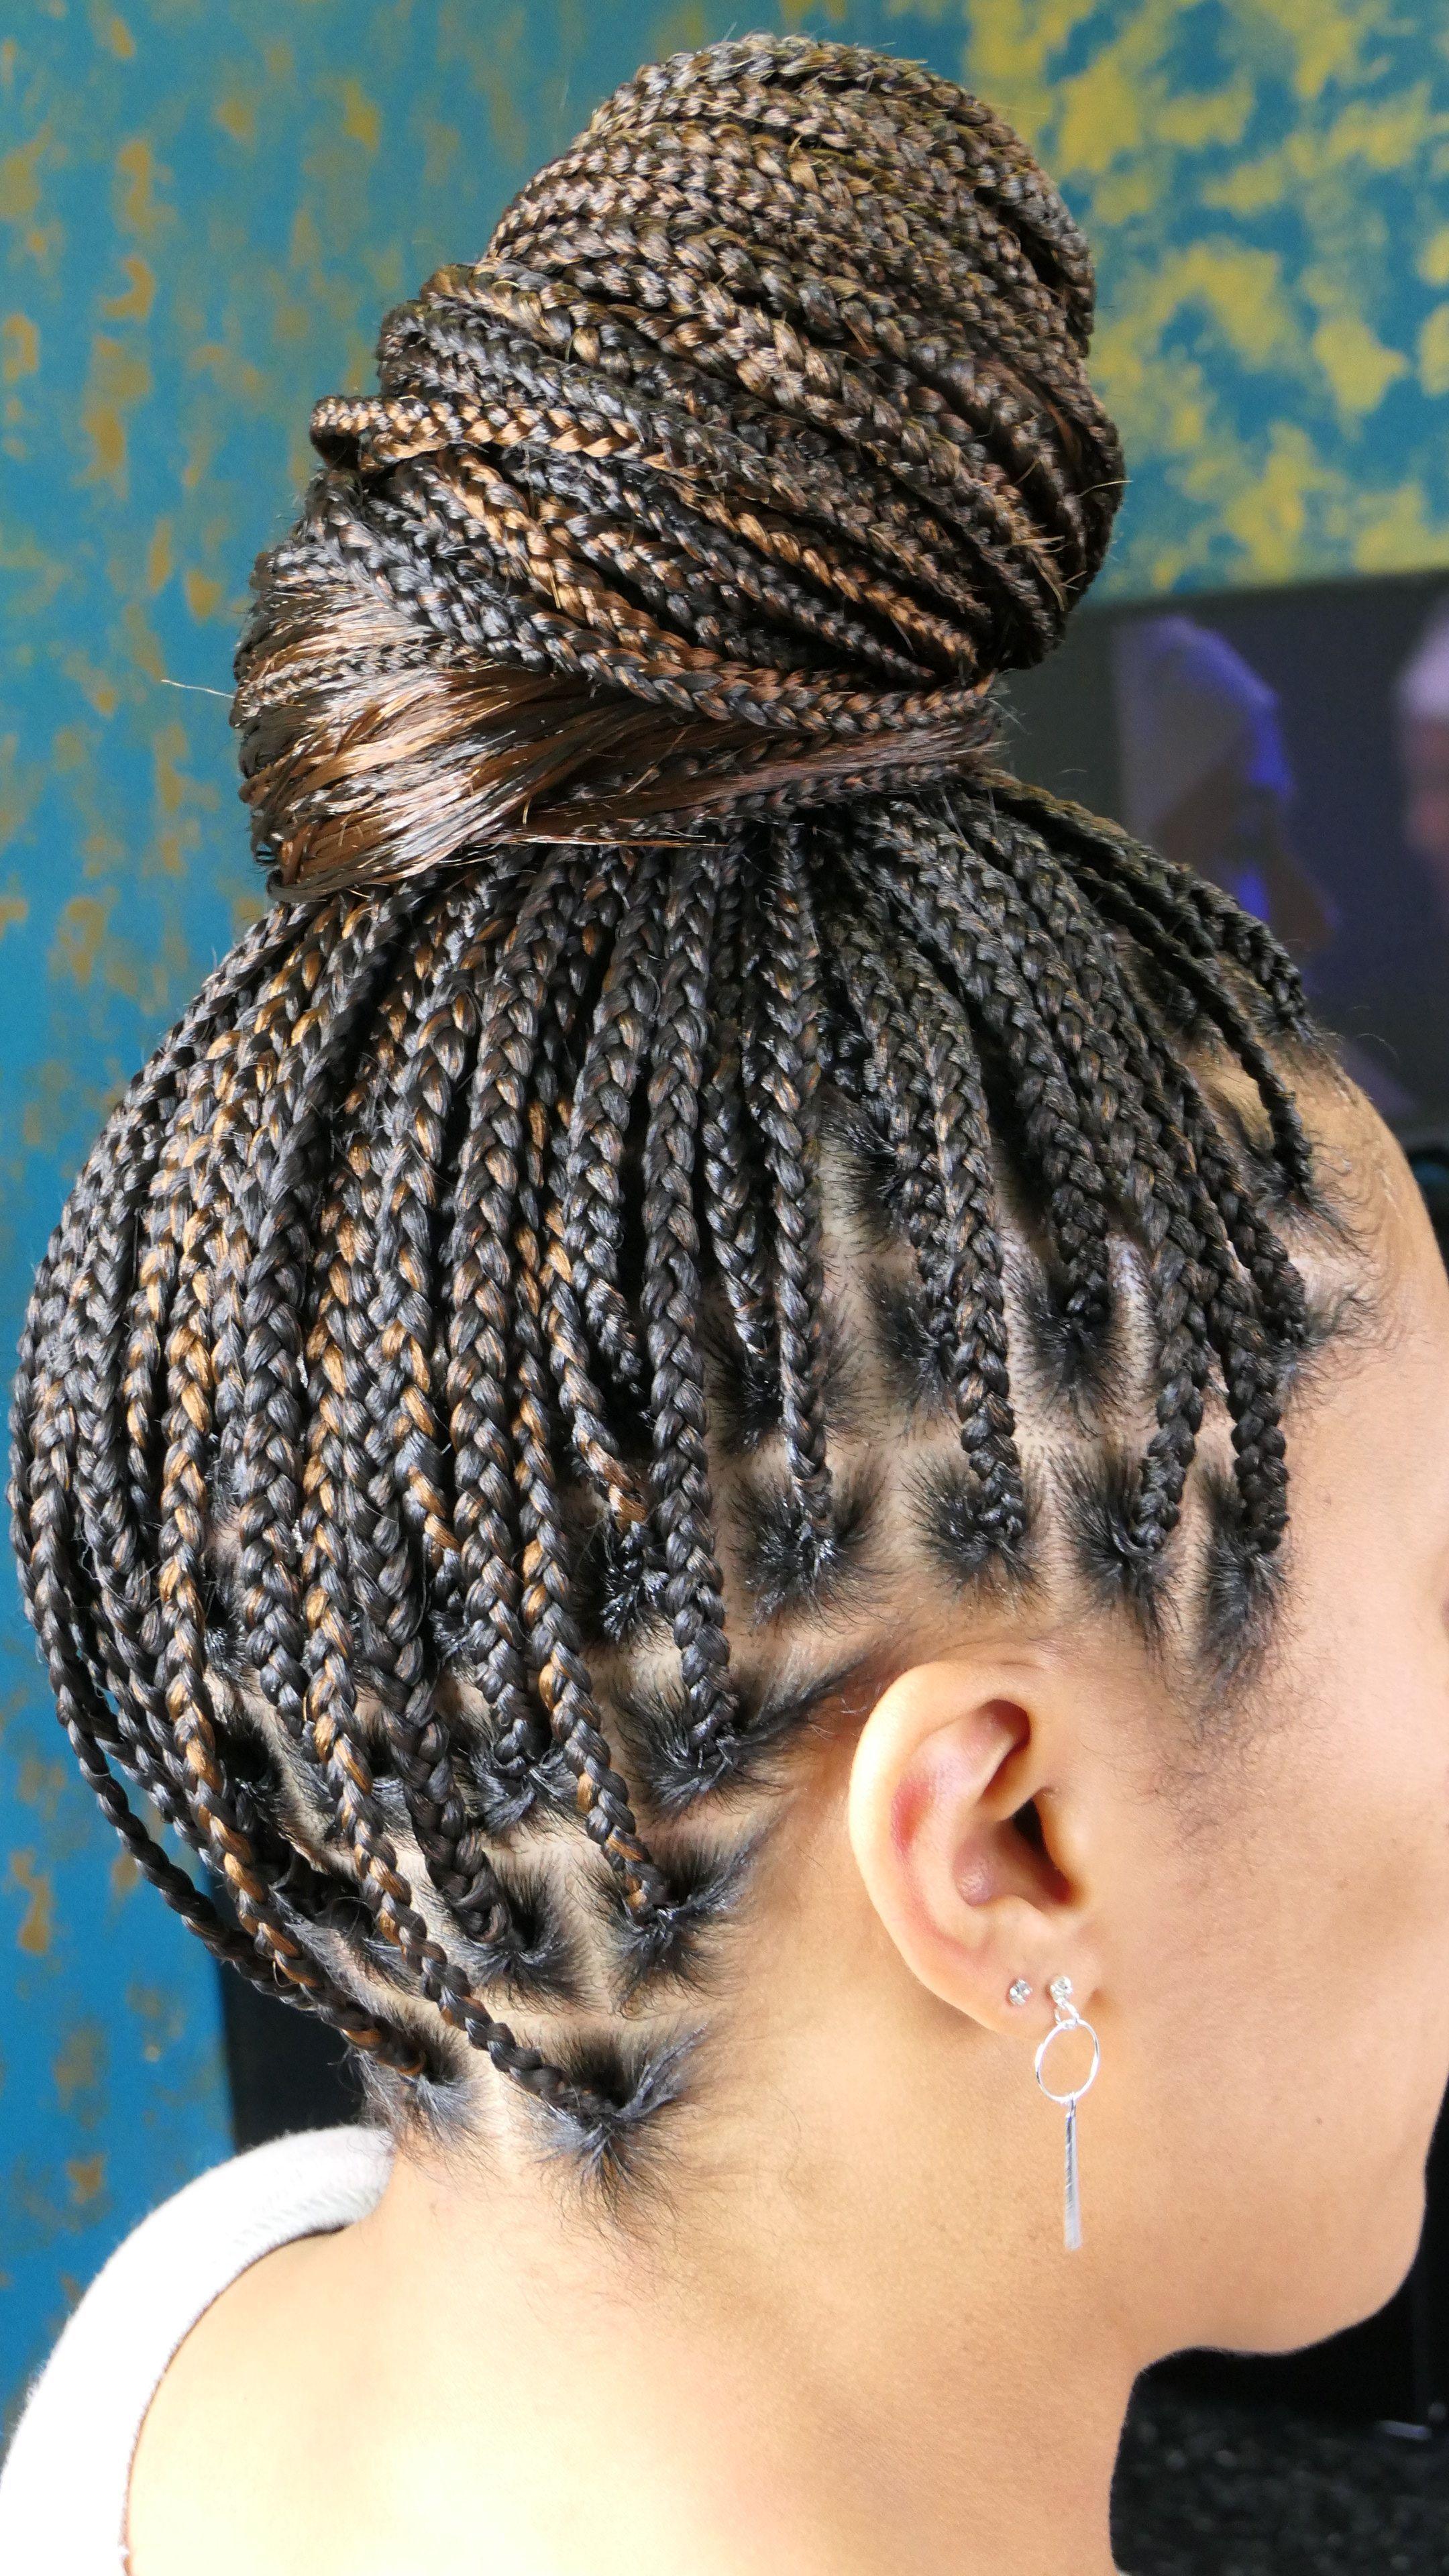 Knotless Braids Braided Hairstyles Updo Box Braids Styling Twist Braid Hairstyles